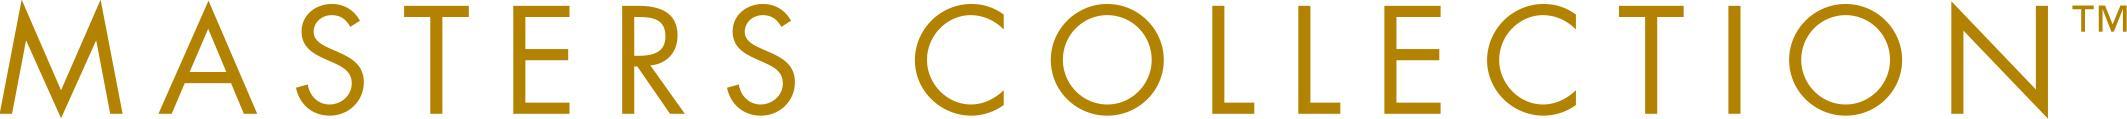 mc-logo-right-color-.jpg